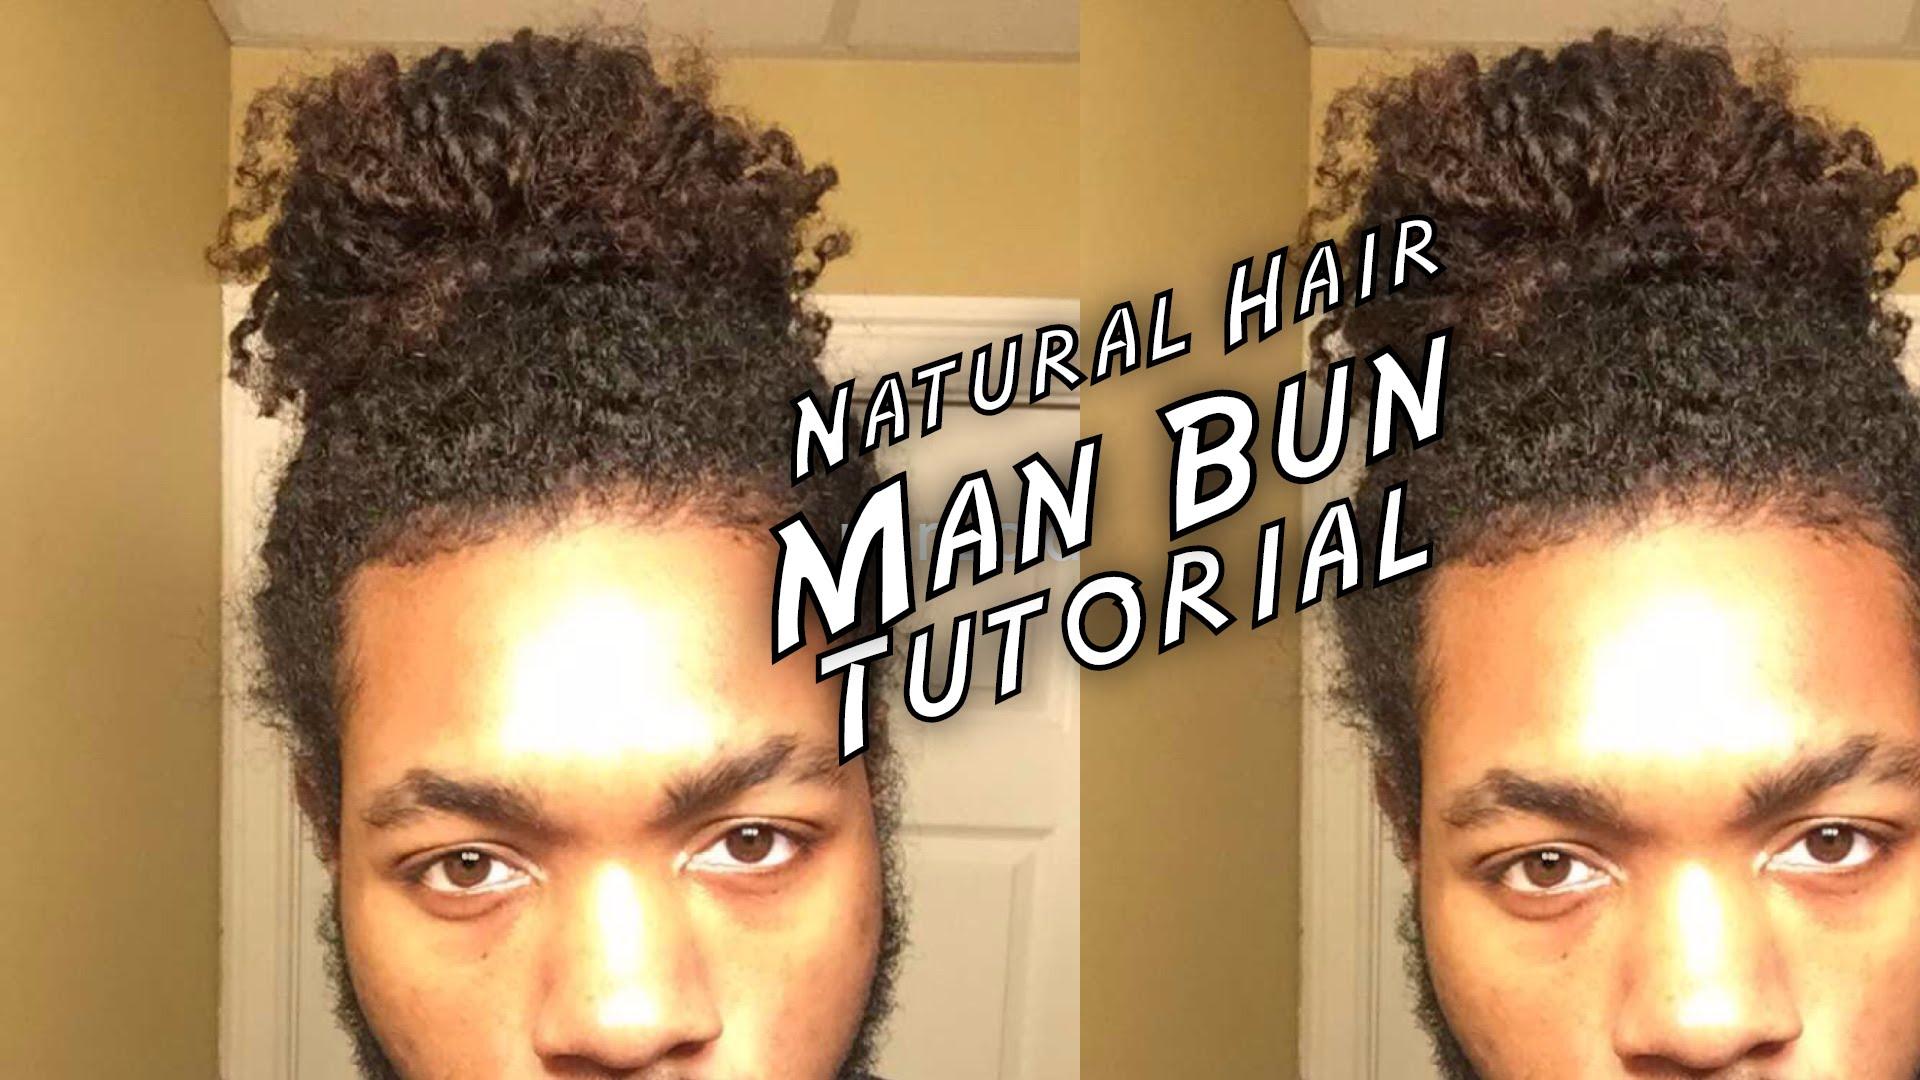 Man Bun Tutorial For Black Men Naturally Curly Hair Adore Natural Me